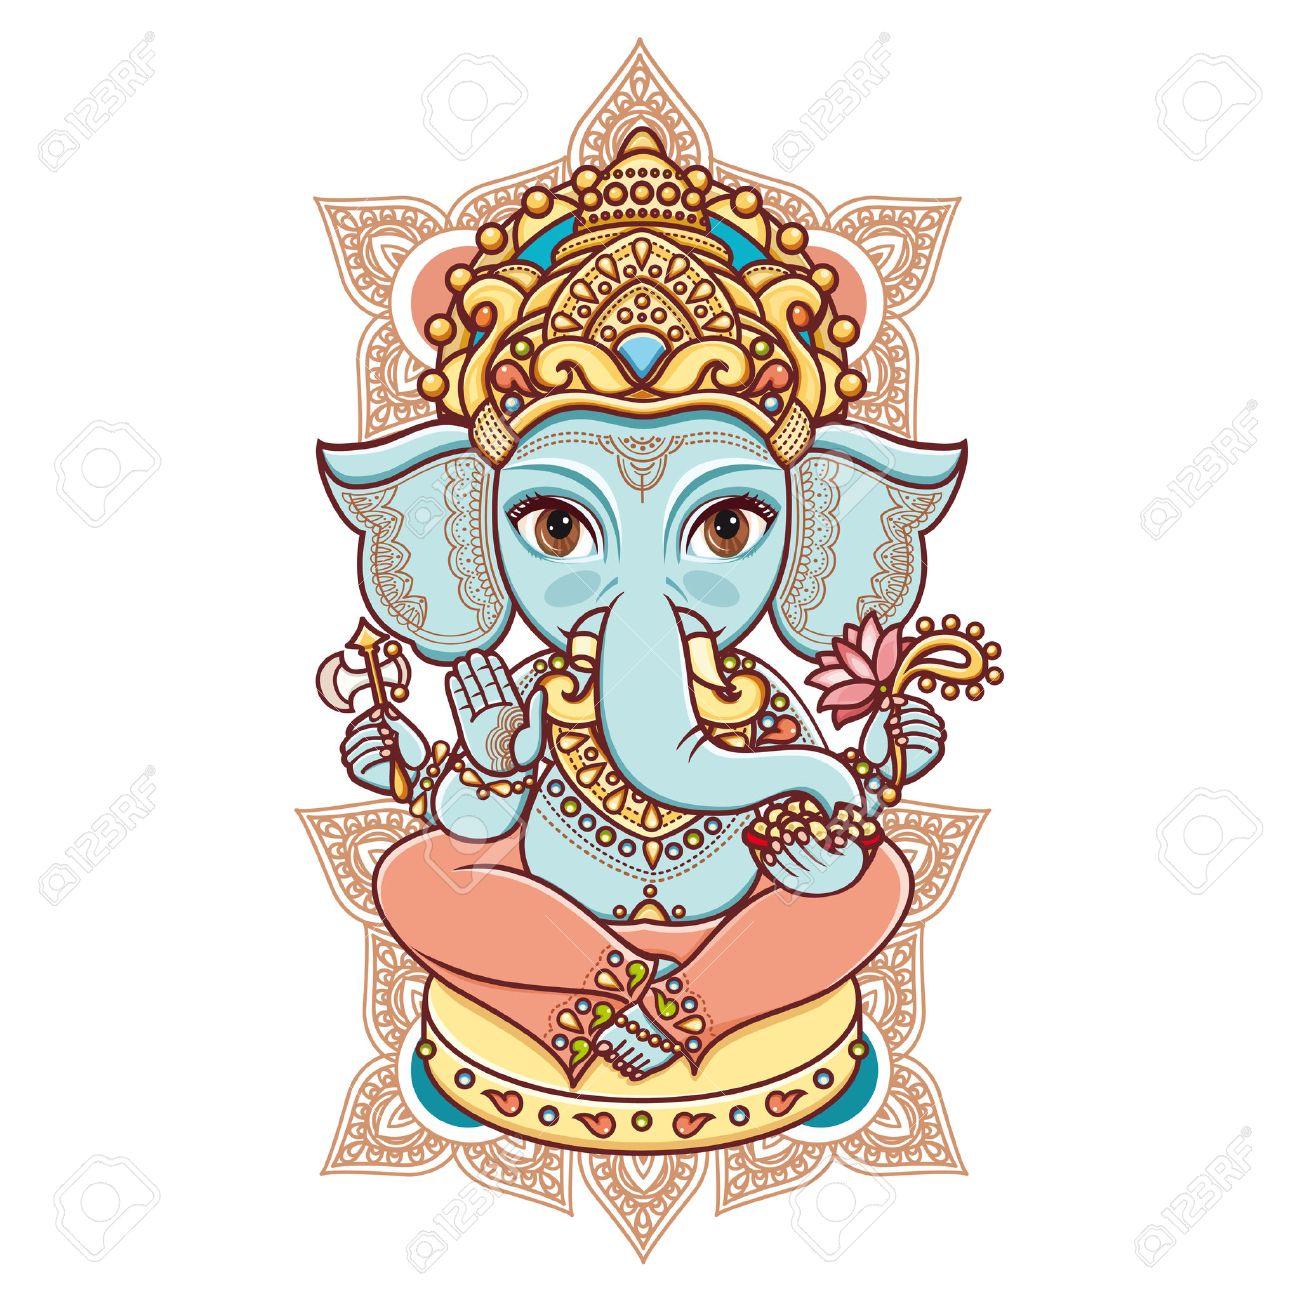 Hindu elephant head God Lord Ganesh. Hinduism. Happy Ganesh Chaturthi.  Vector elements isolated